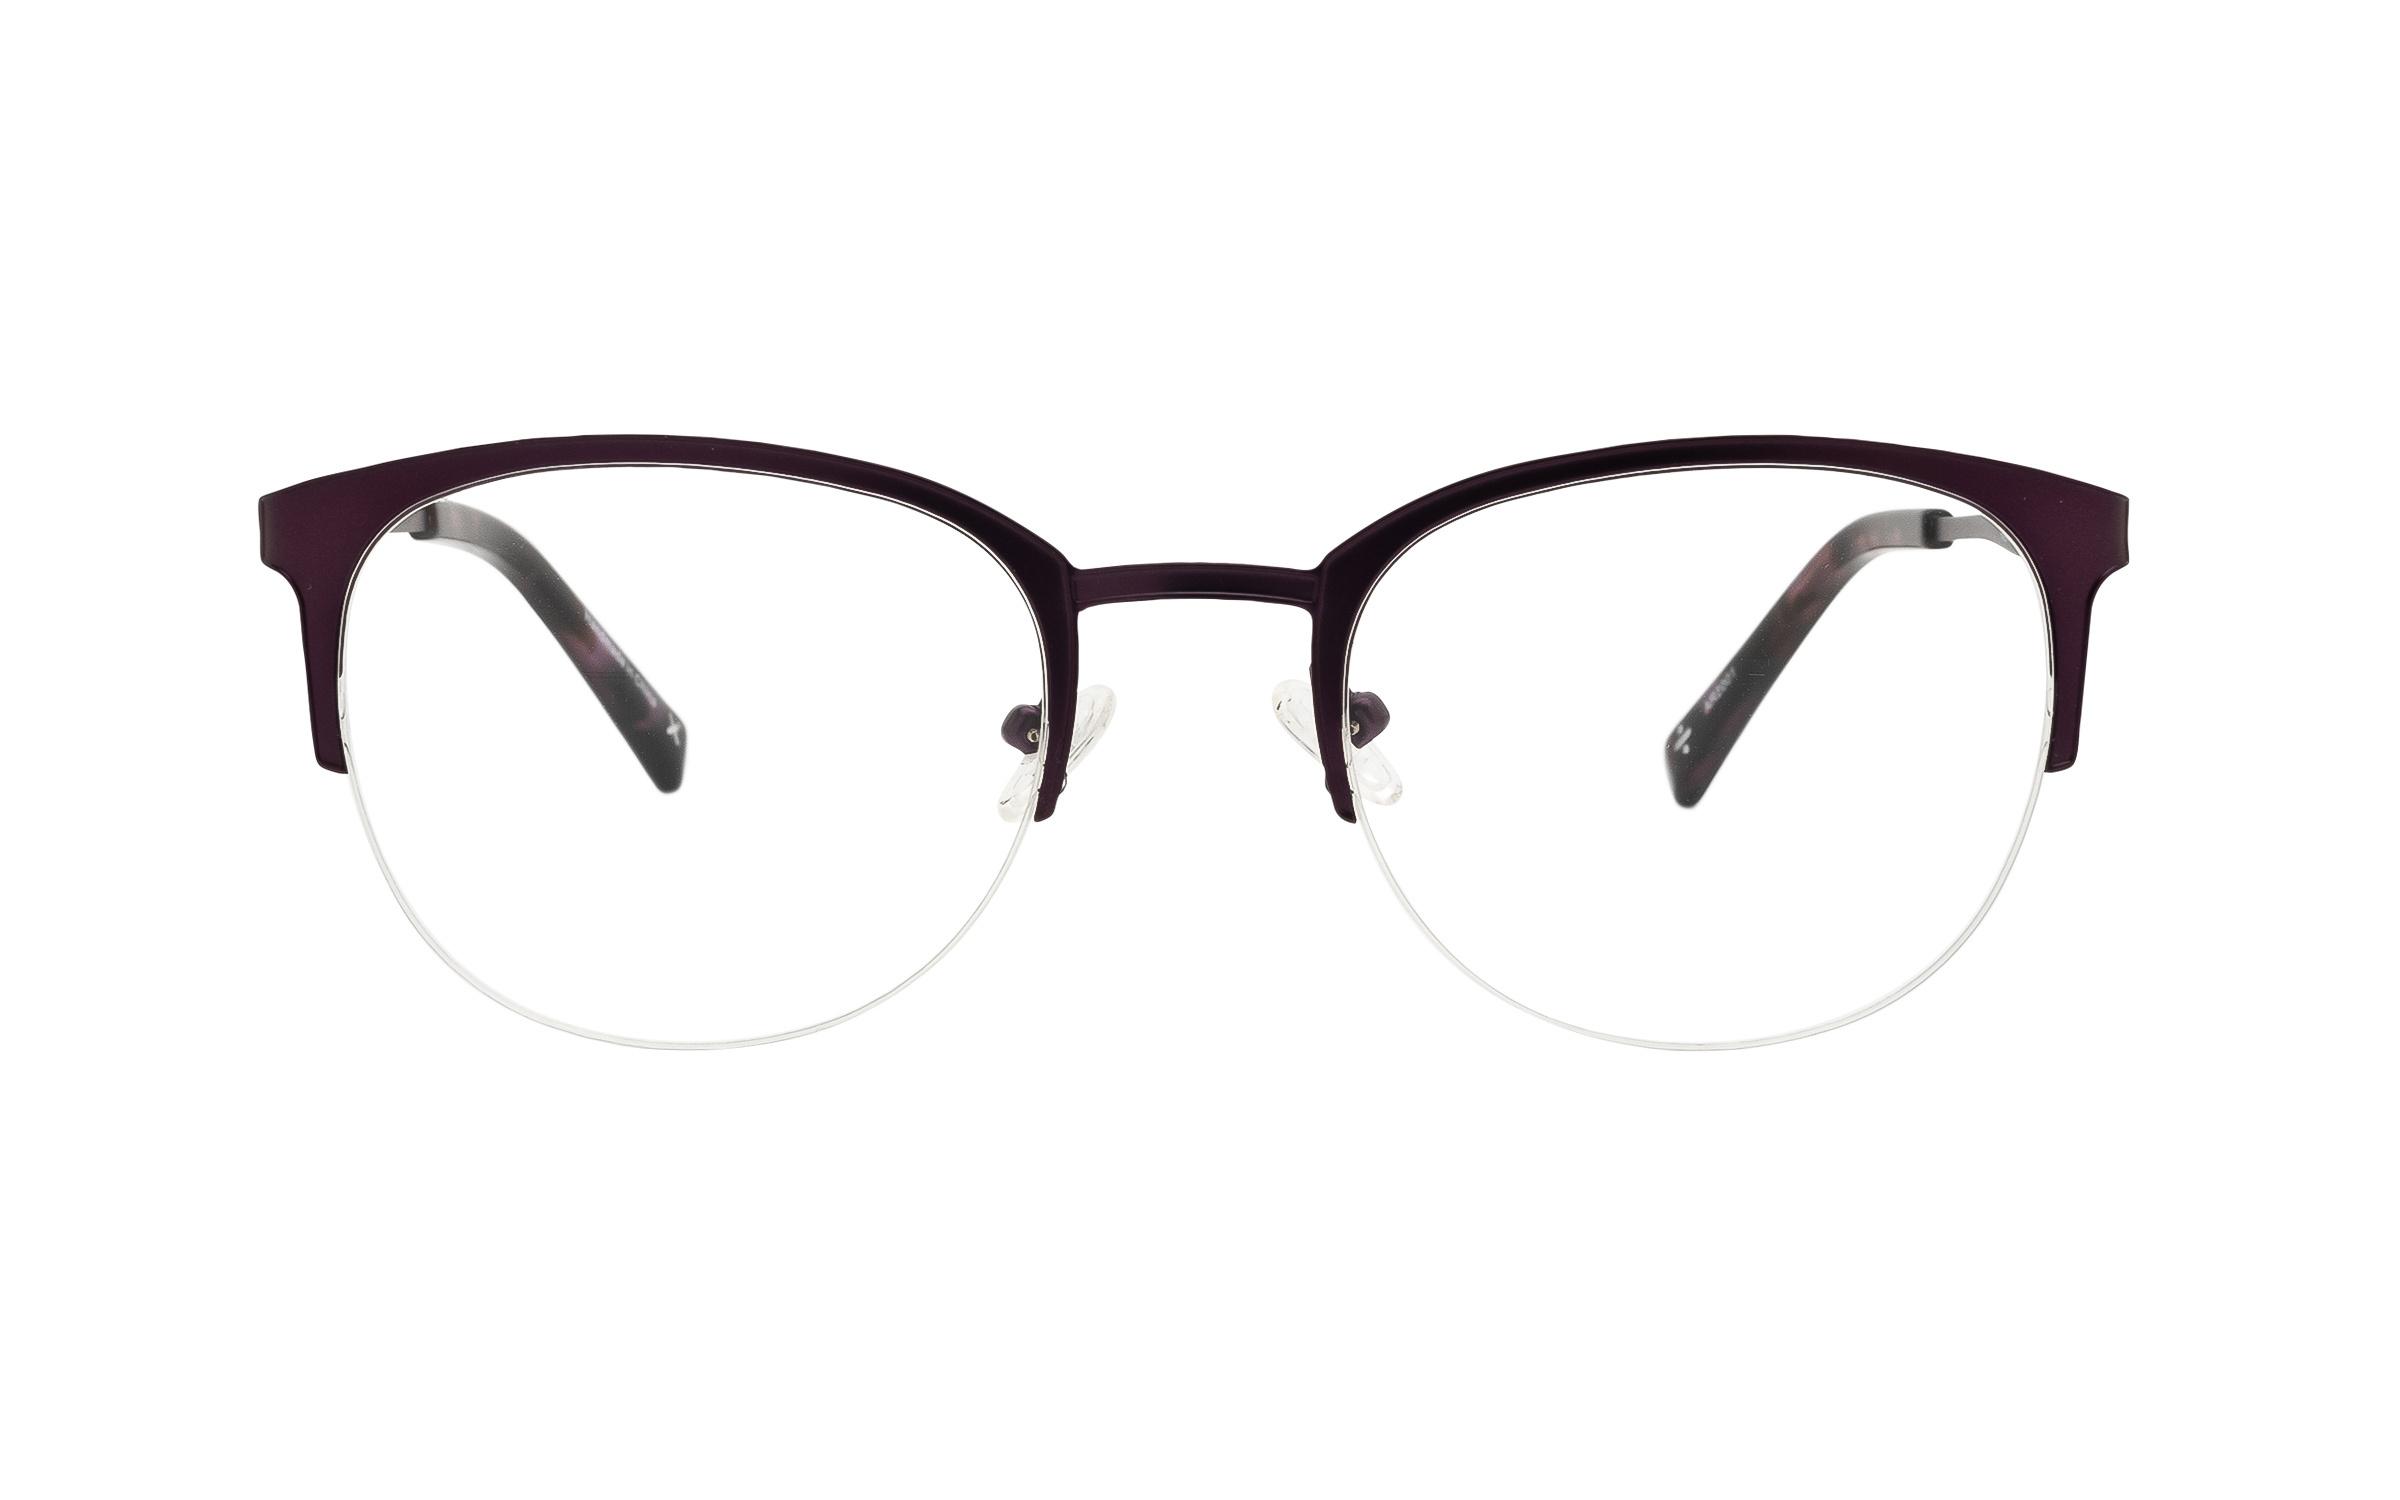 http://www.coastal.com/ - Derek Cardigan Helike TIT010 C03 (51) Eyeglasses and Frame in Purple | Plastic – Online Coastal